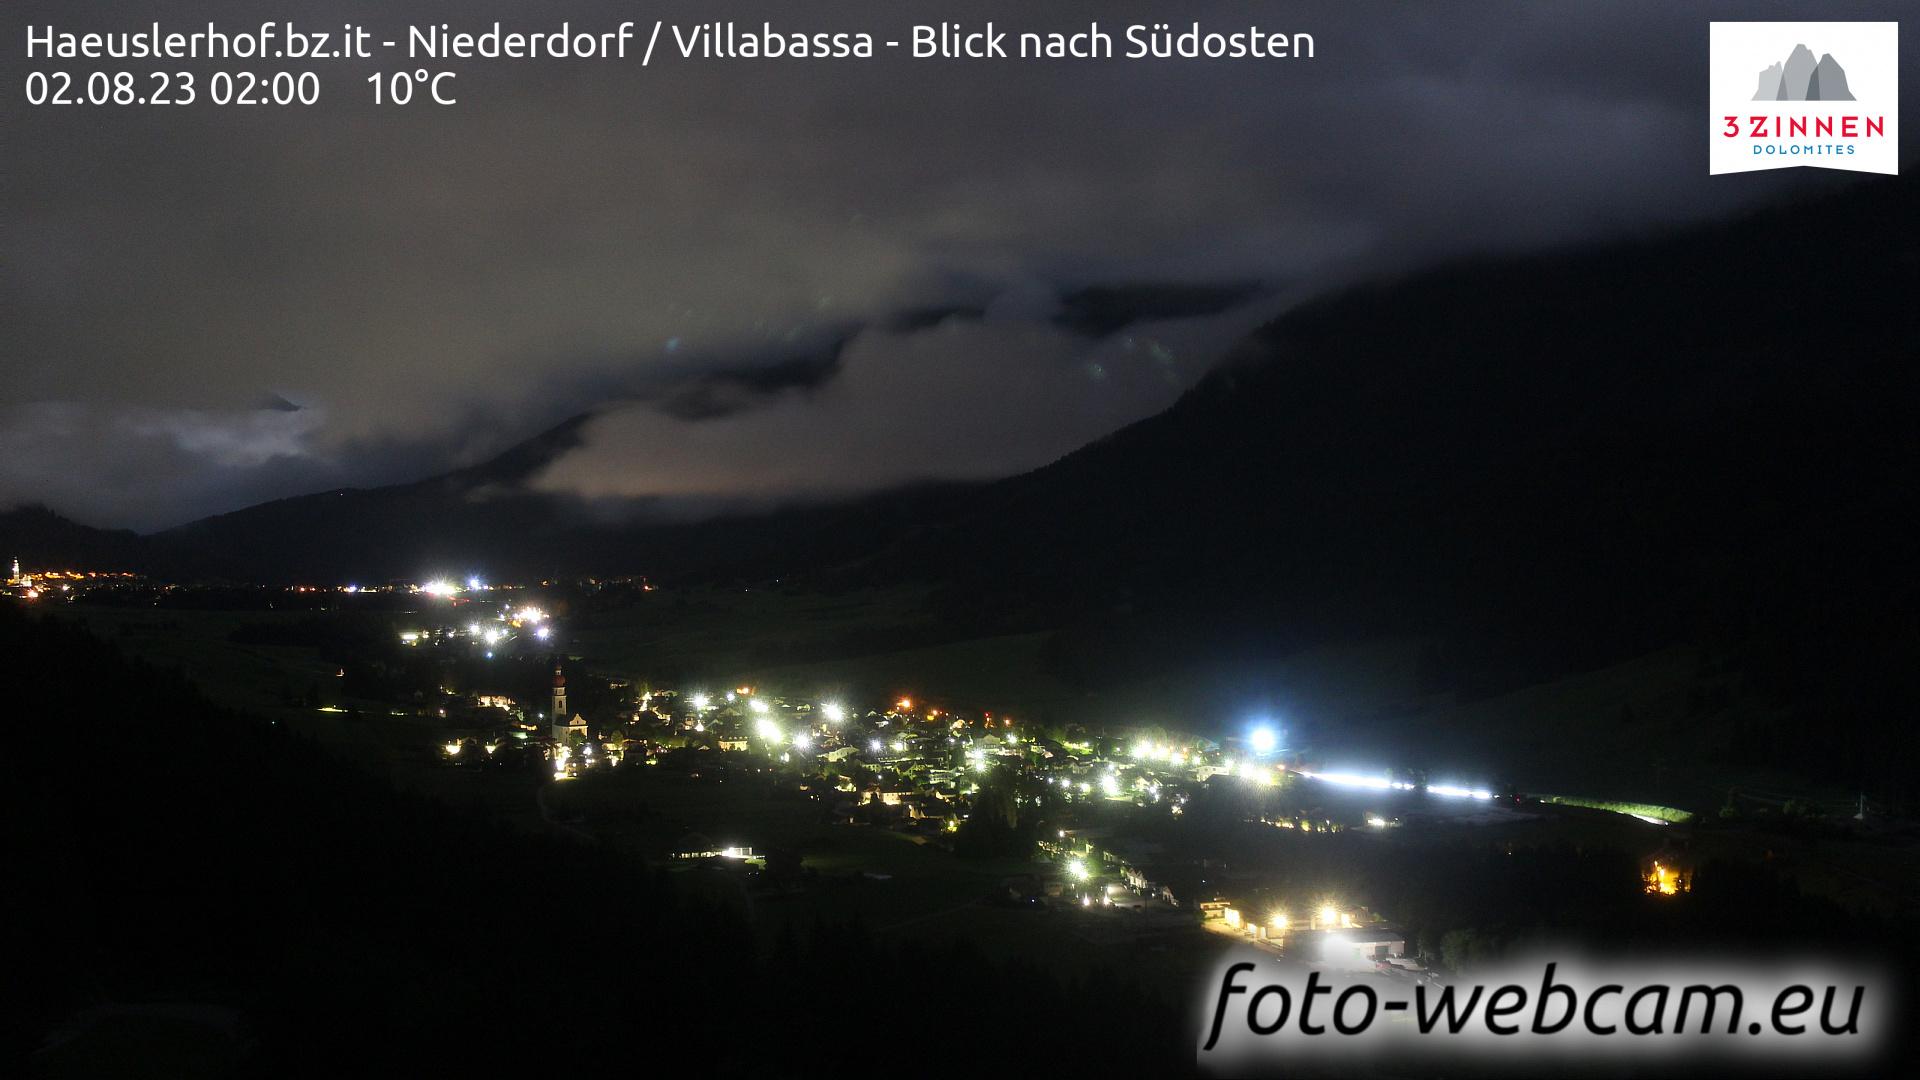 Niederdorf Wed. 02:27